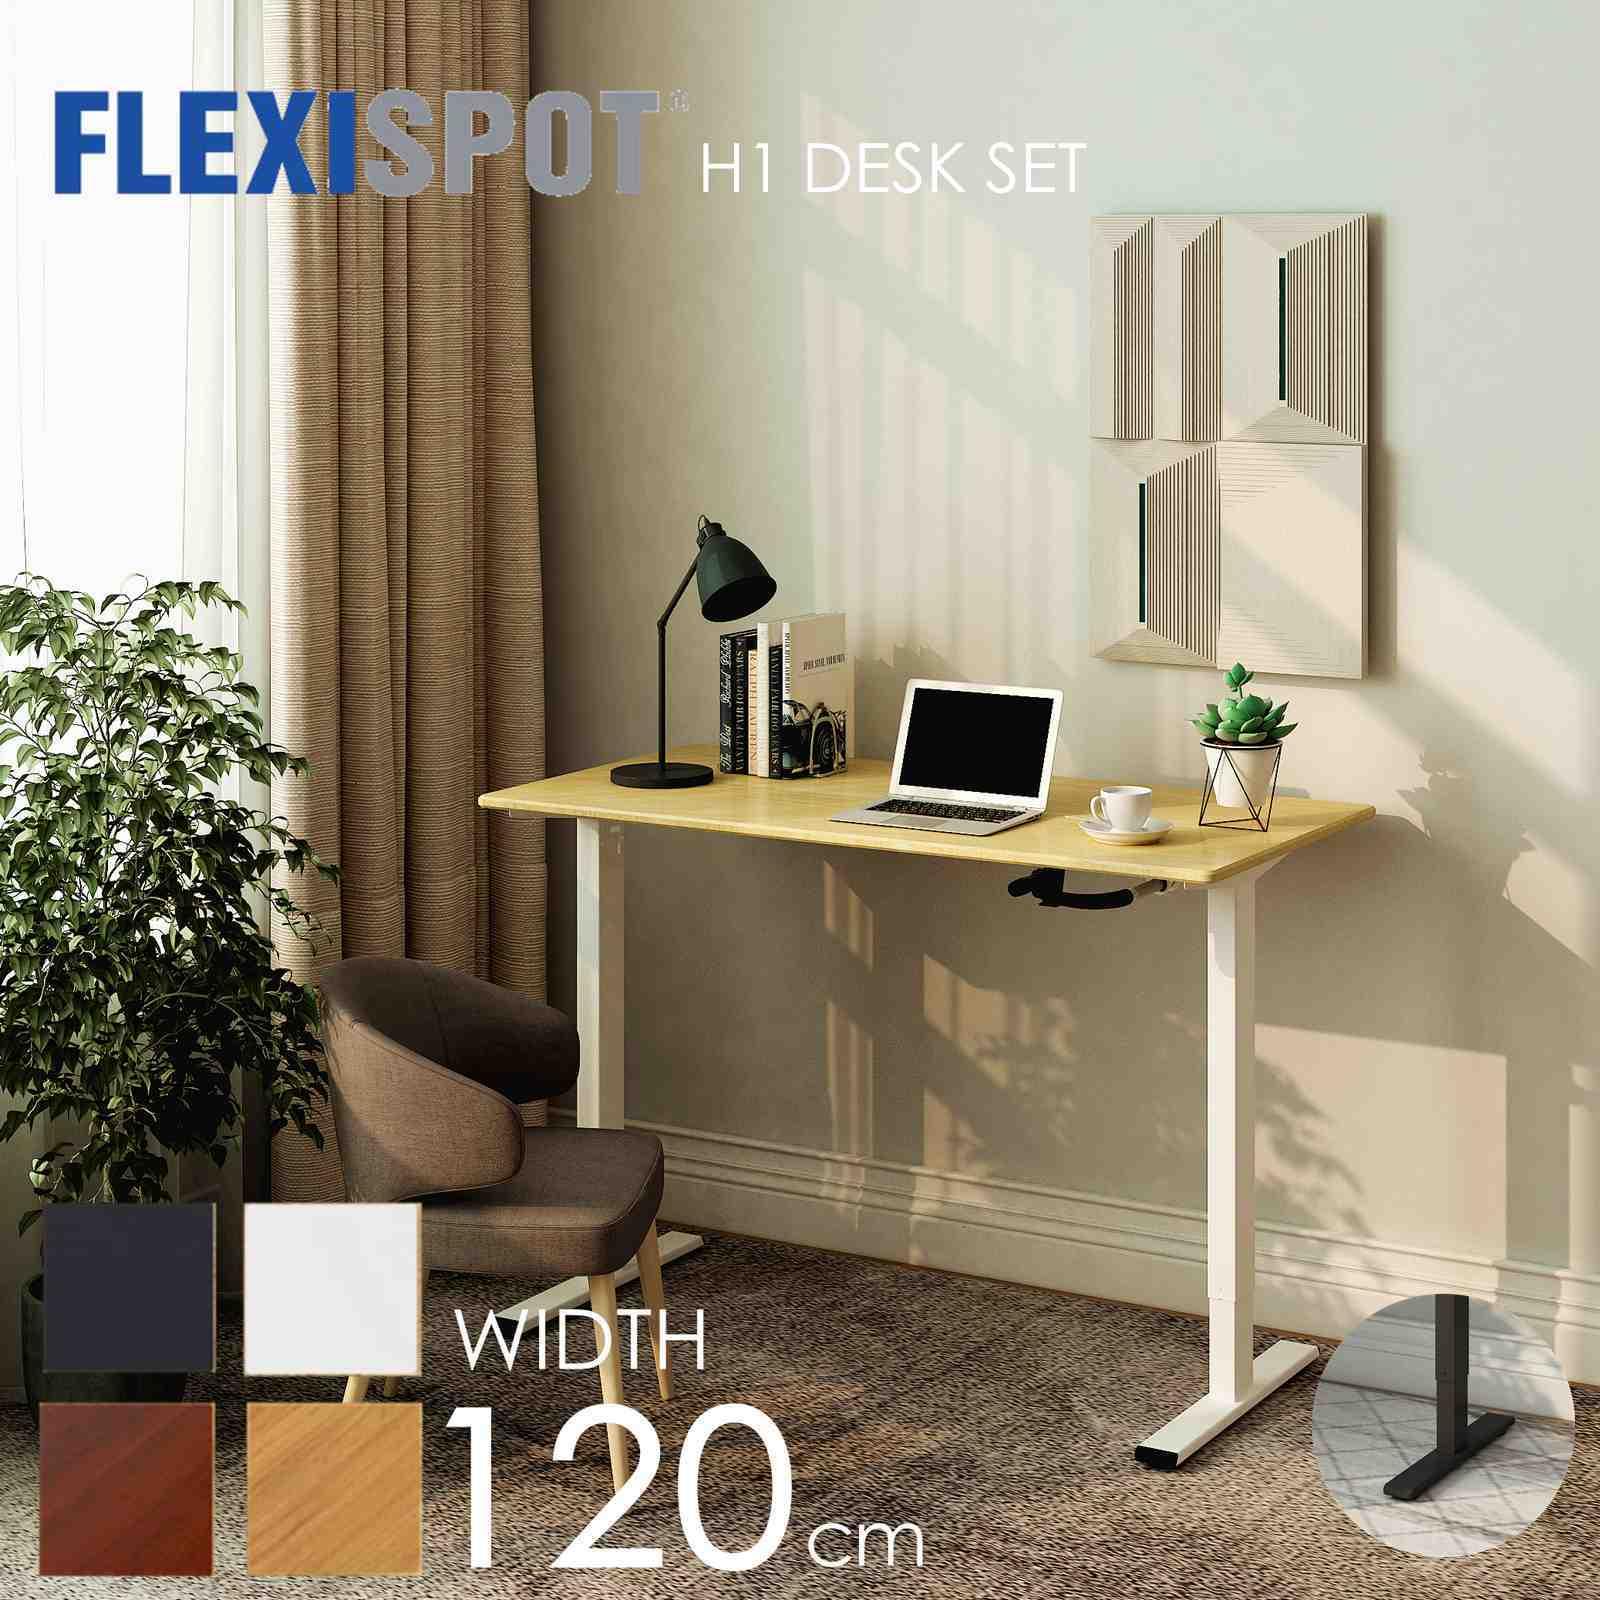 FlexiSpotフレキシスポットスタンディングデスクオフィスデスク高さ調節手動式昇降デスク昇降テーブル学習机書斎テーブルパソコンデスク机デスクH1シリーズ天板120*60cm四色選択脚部二色選択可能